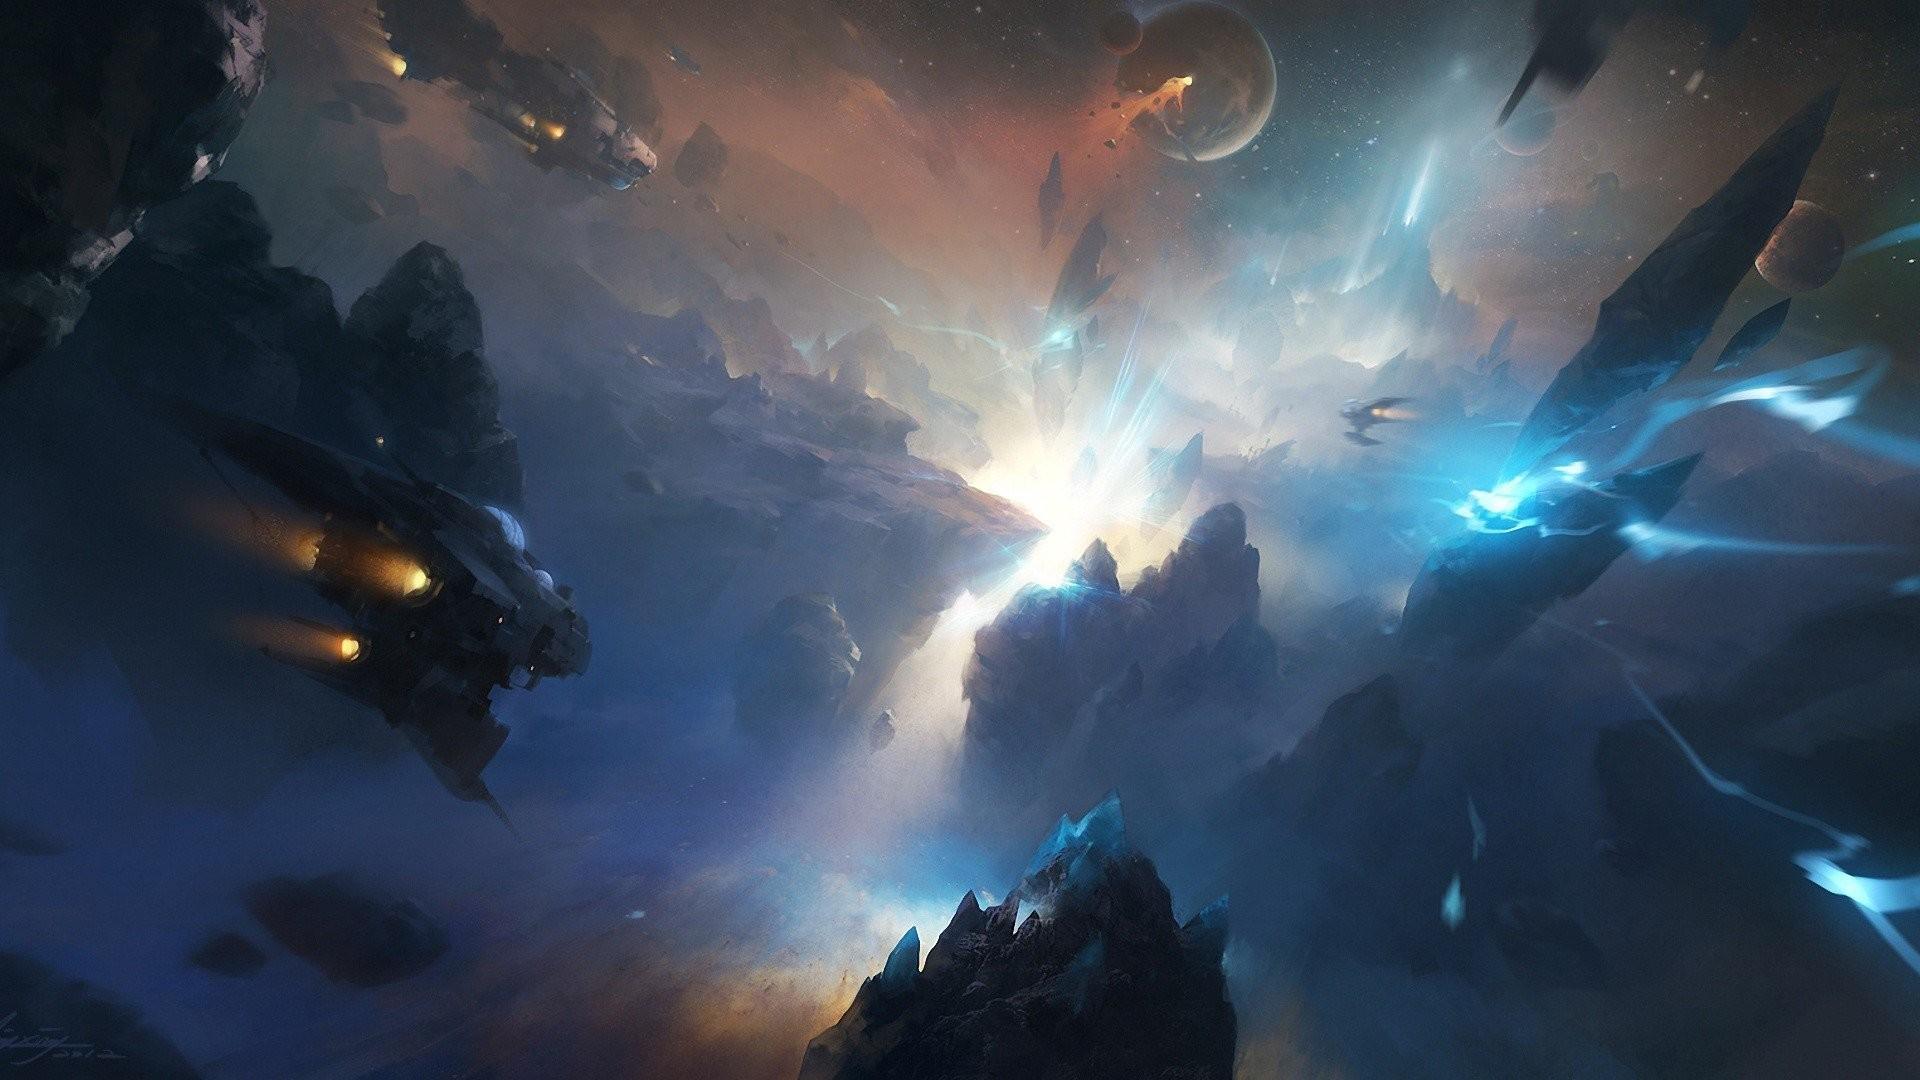 Spaceships Science Fiction Artwork Fantasy Art Futuristic Space Digital